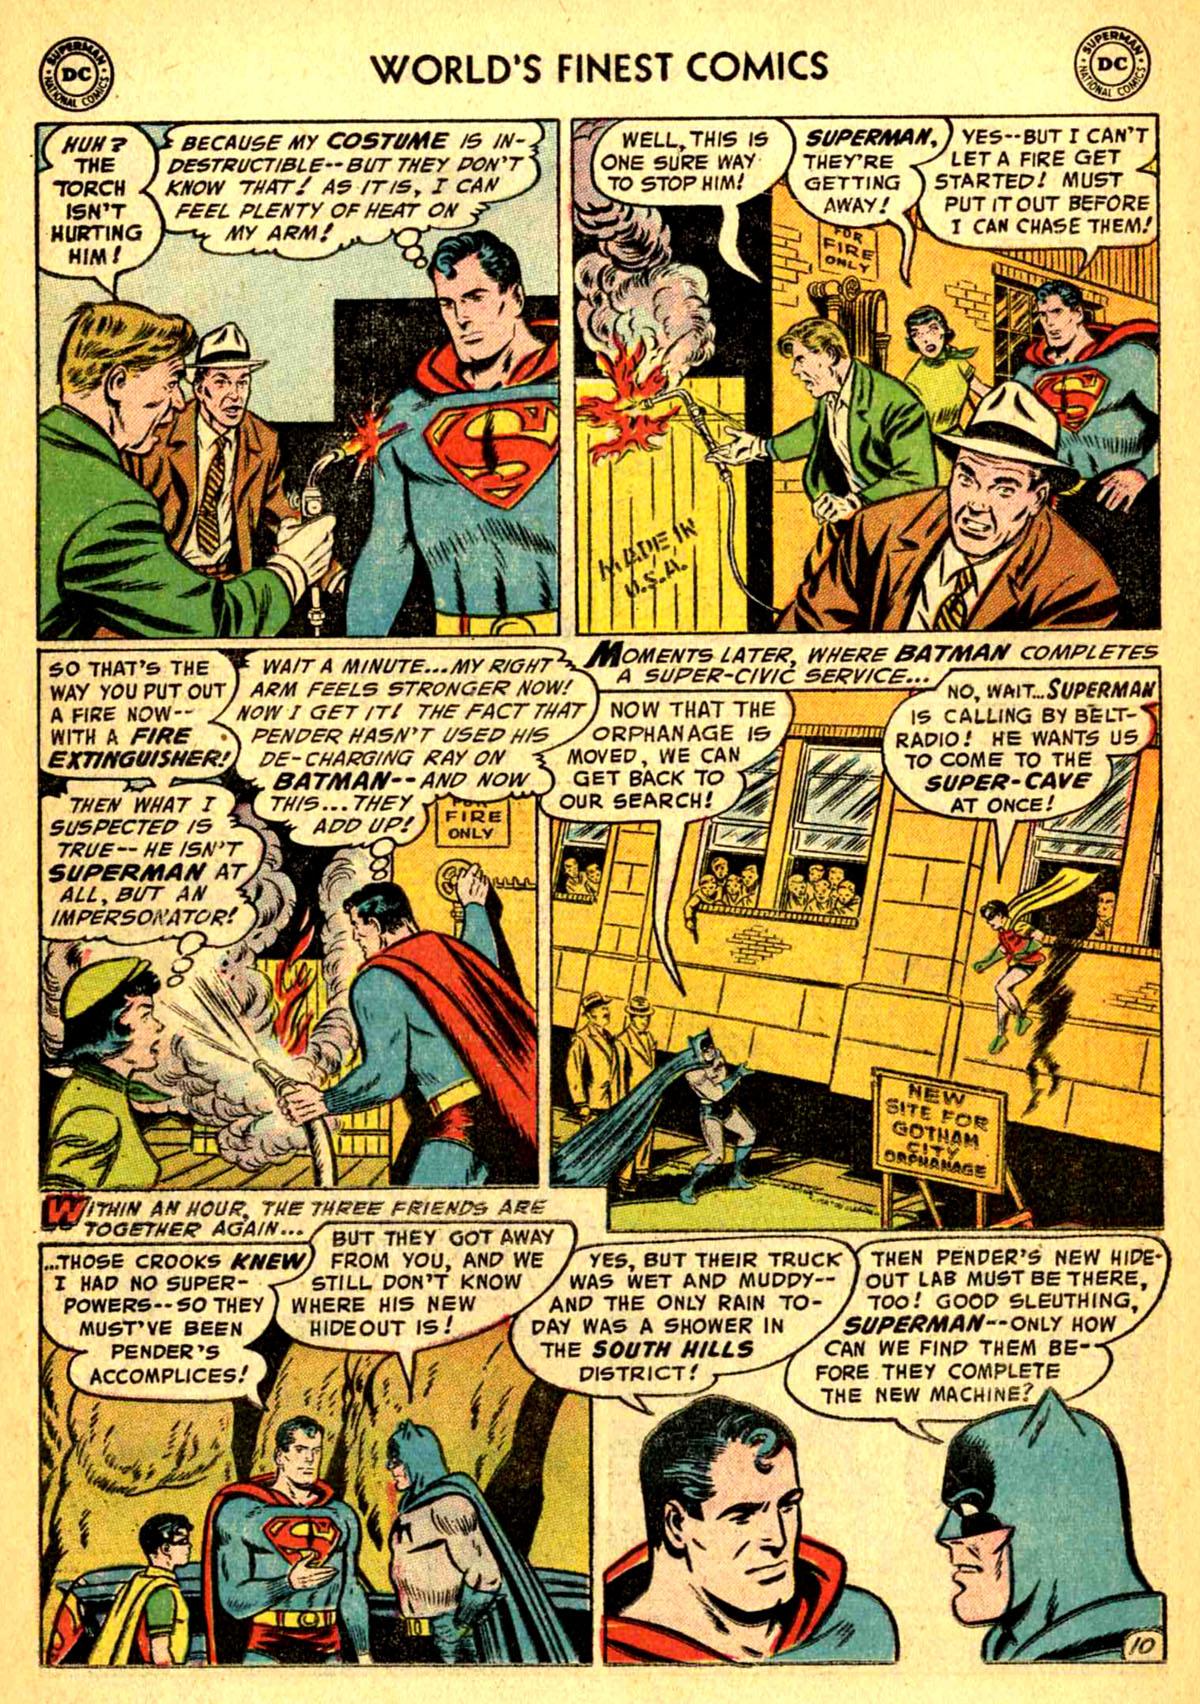 Read online World's Finest Comics comic -  Issue #77 - 12